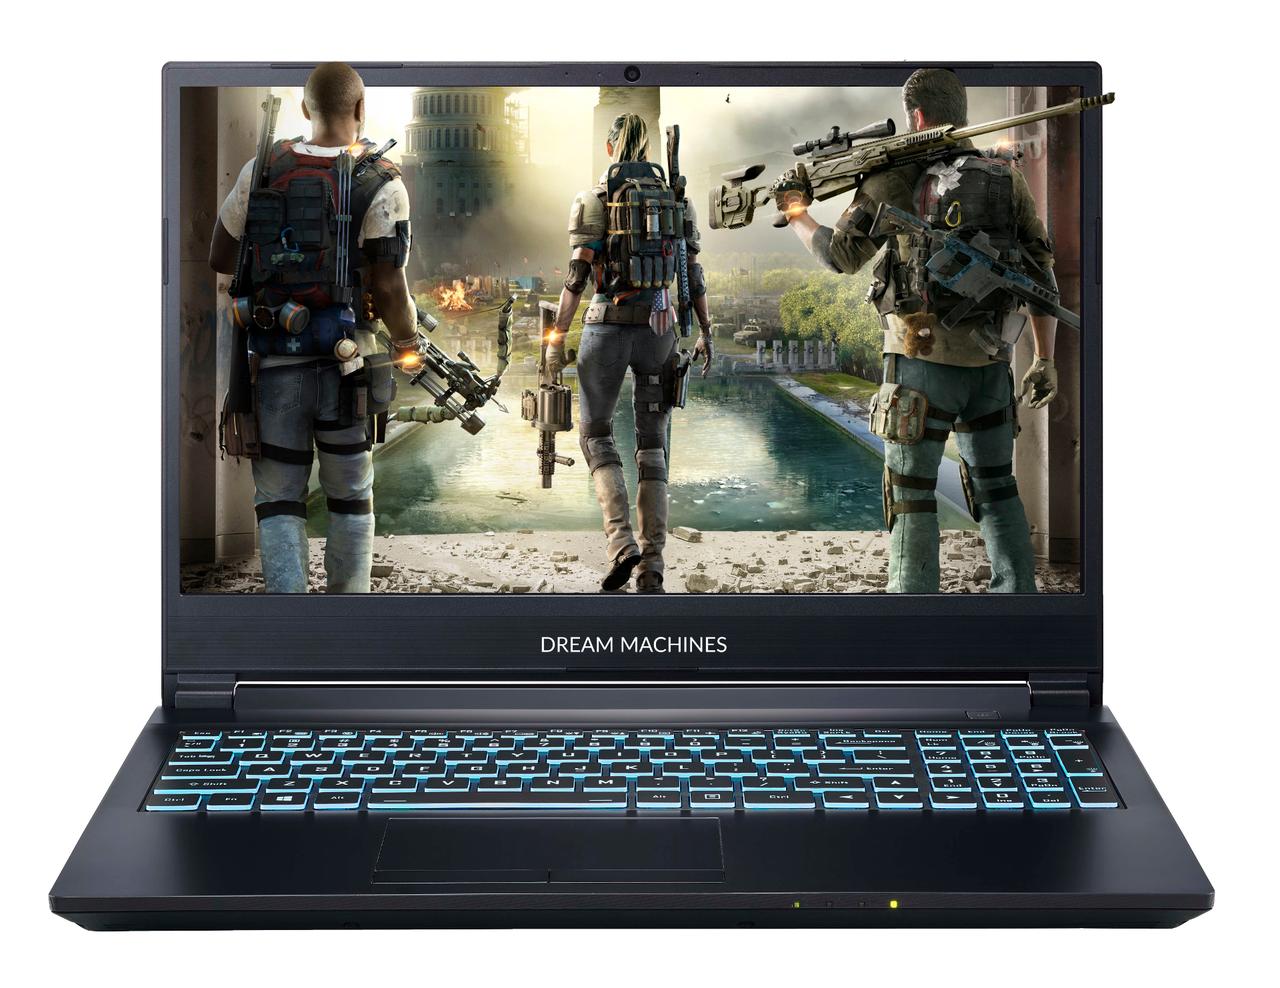 Игровой ноутбук Dream Machines RS2070Q-17KZ03 <17.3'' FHD 144Hz Slim, i7-9750H / RTX2070 /32GB/SSD 2TB/